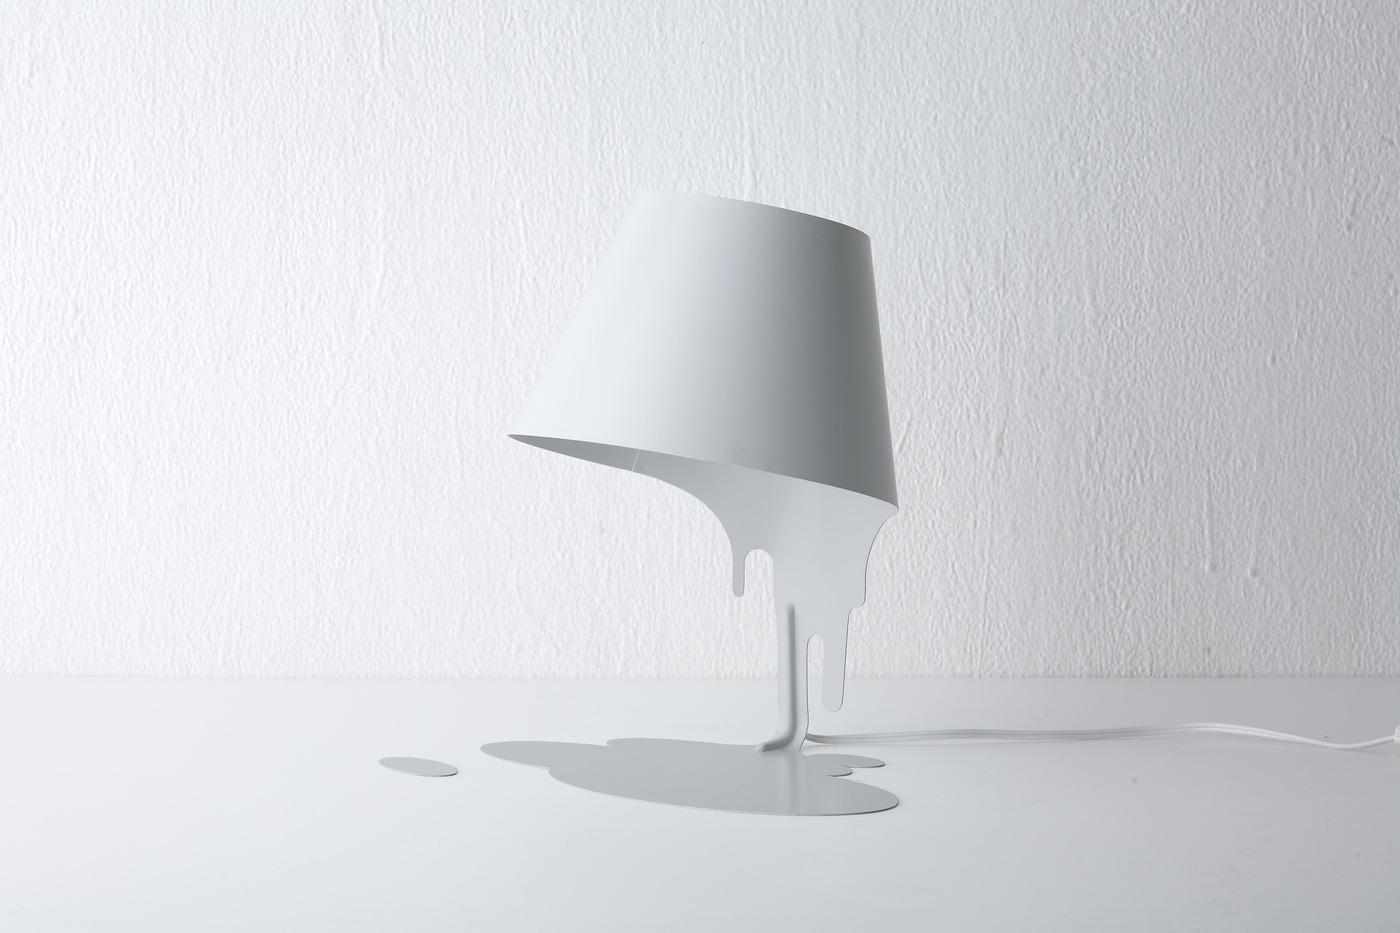 awesome-design-ideas-Liquid-Lamp-Kouichi-Okamoto-Kyouei-2